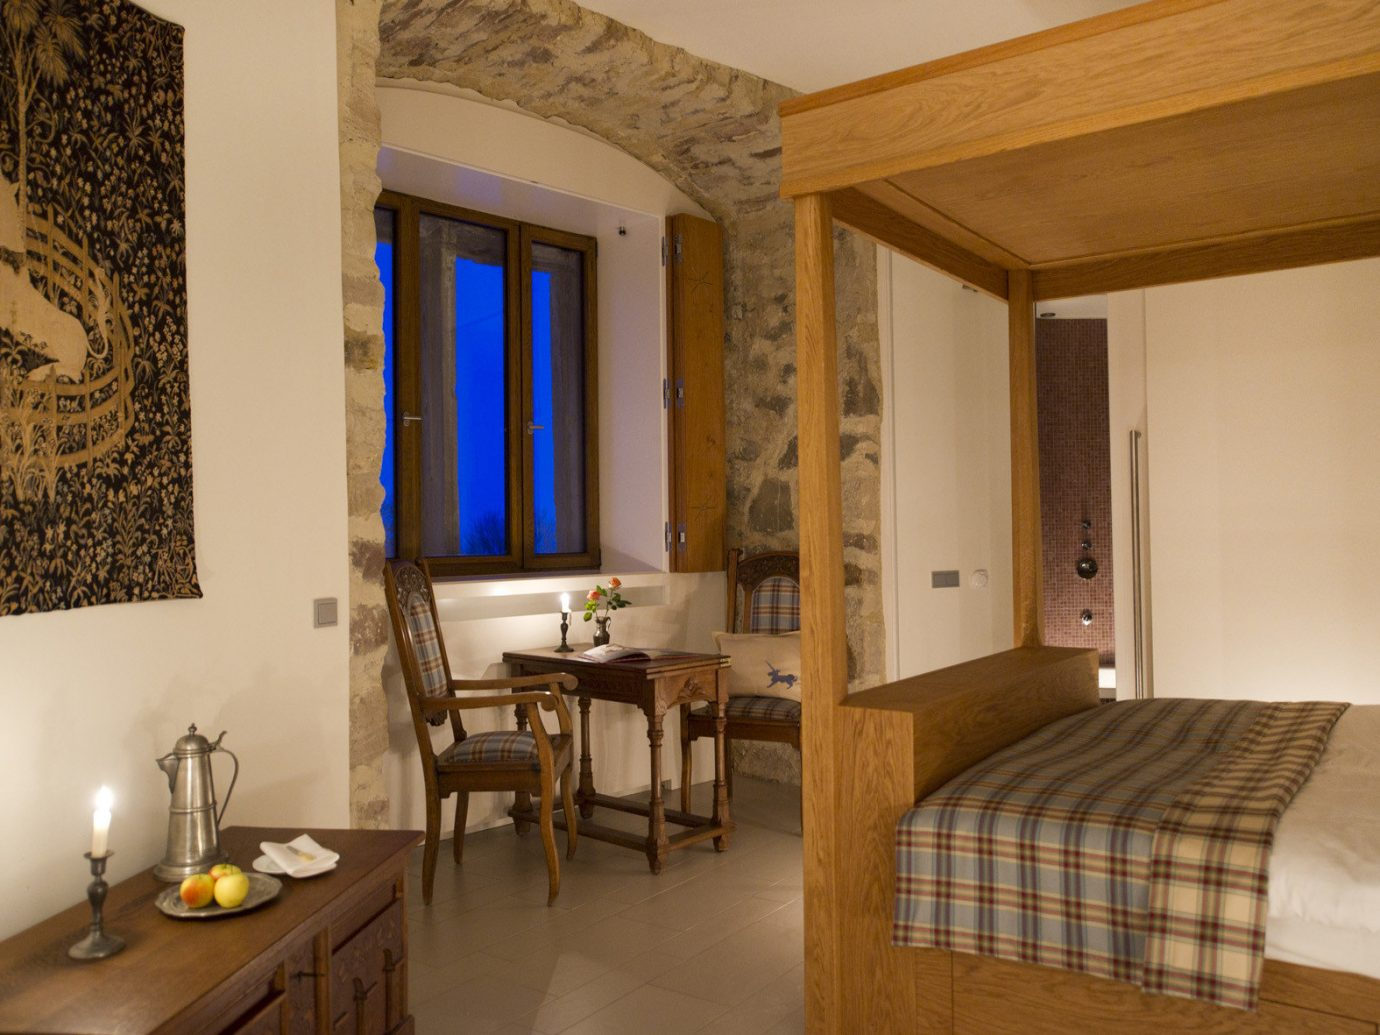 Hotels Landmarks Luxury Travel indoor wall floor room ceiling Suite interior design hotel Bedroom furniture area wood